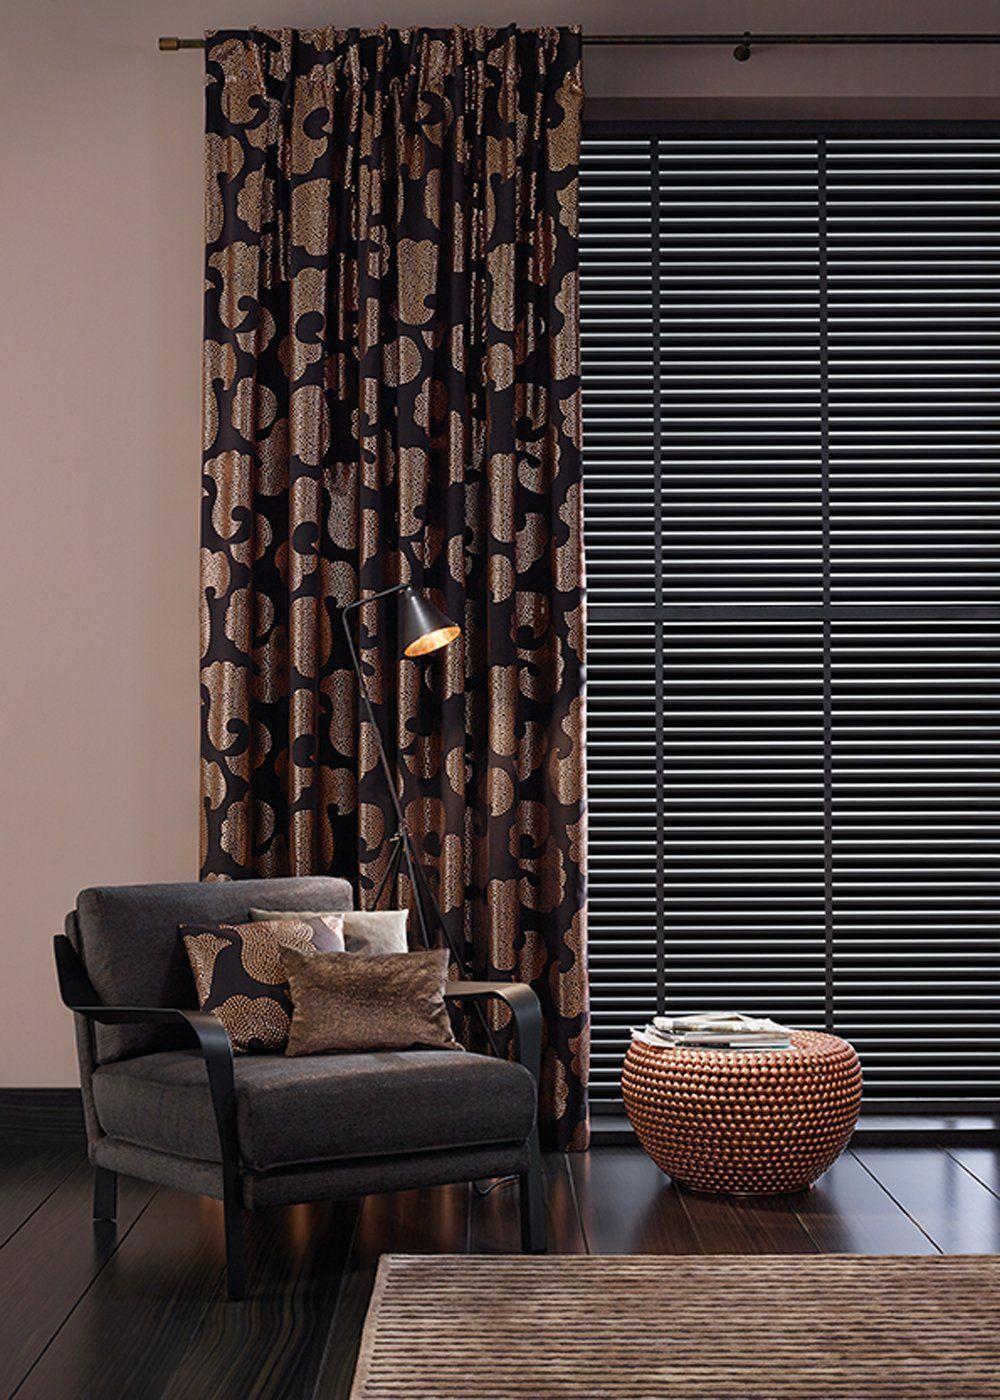 Dark brown bedroom curtains in mix with black jalousie